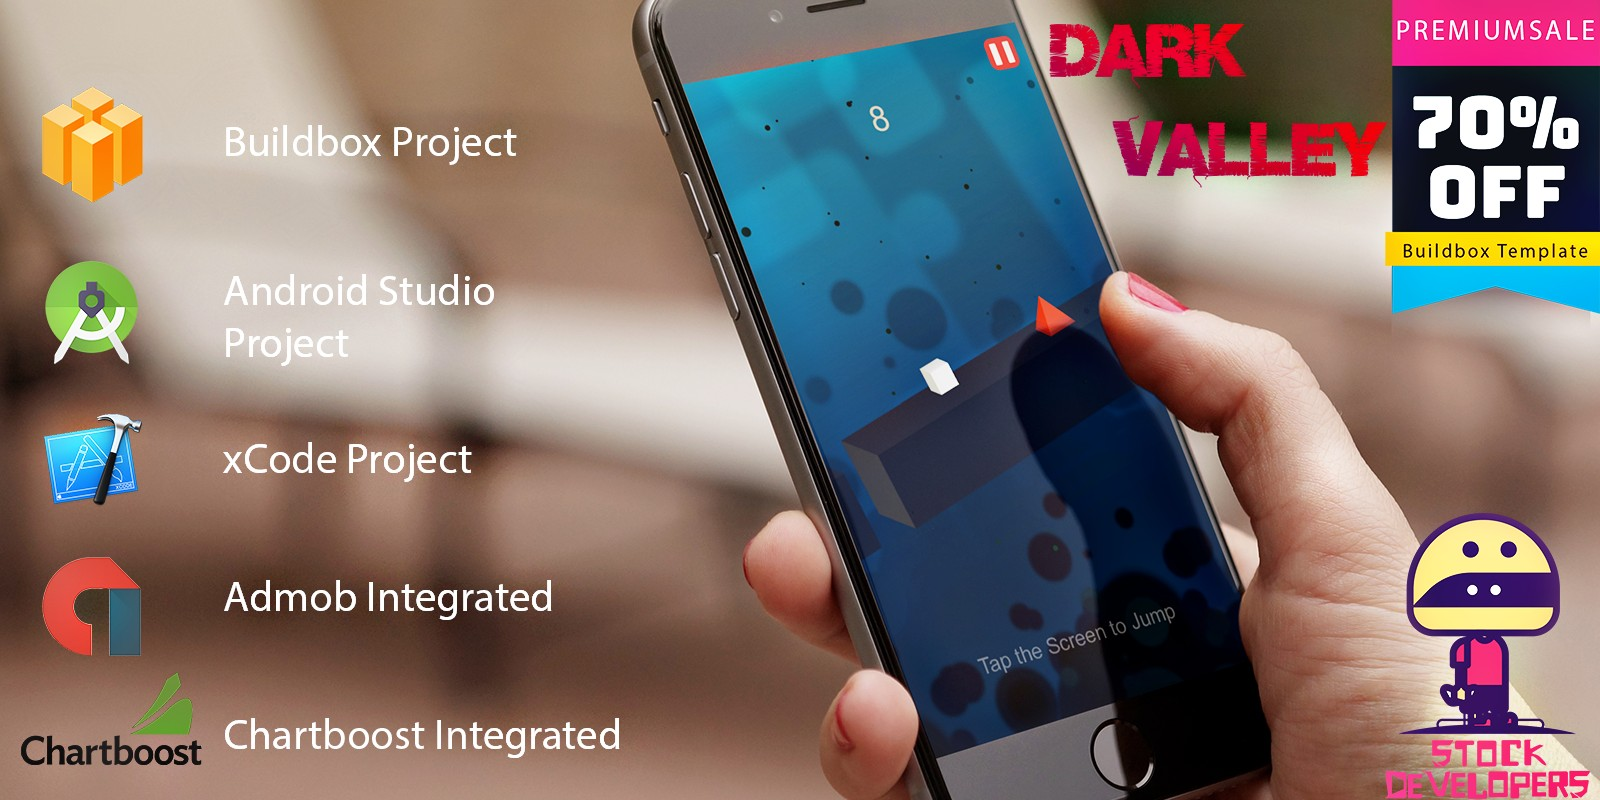 Dark Valley - Buildbox Template